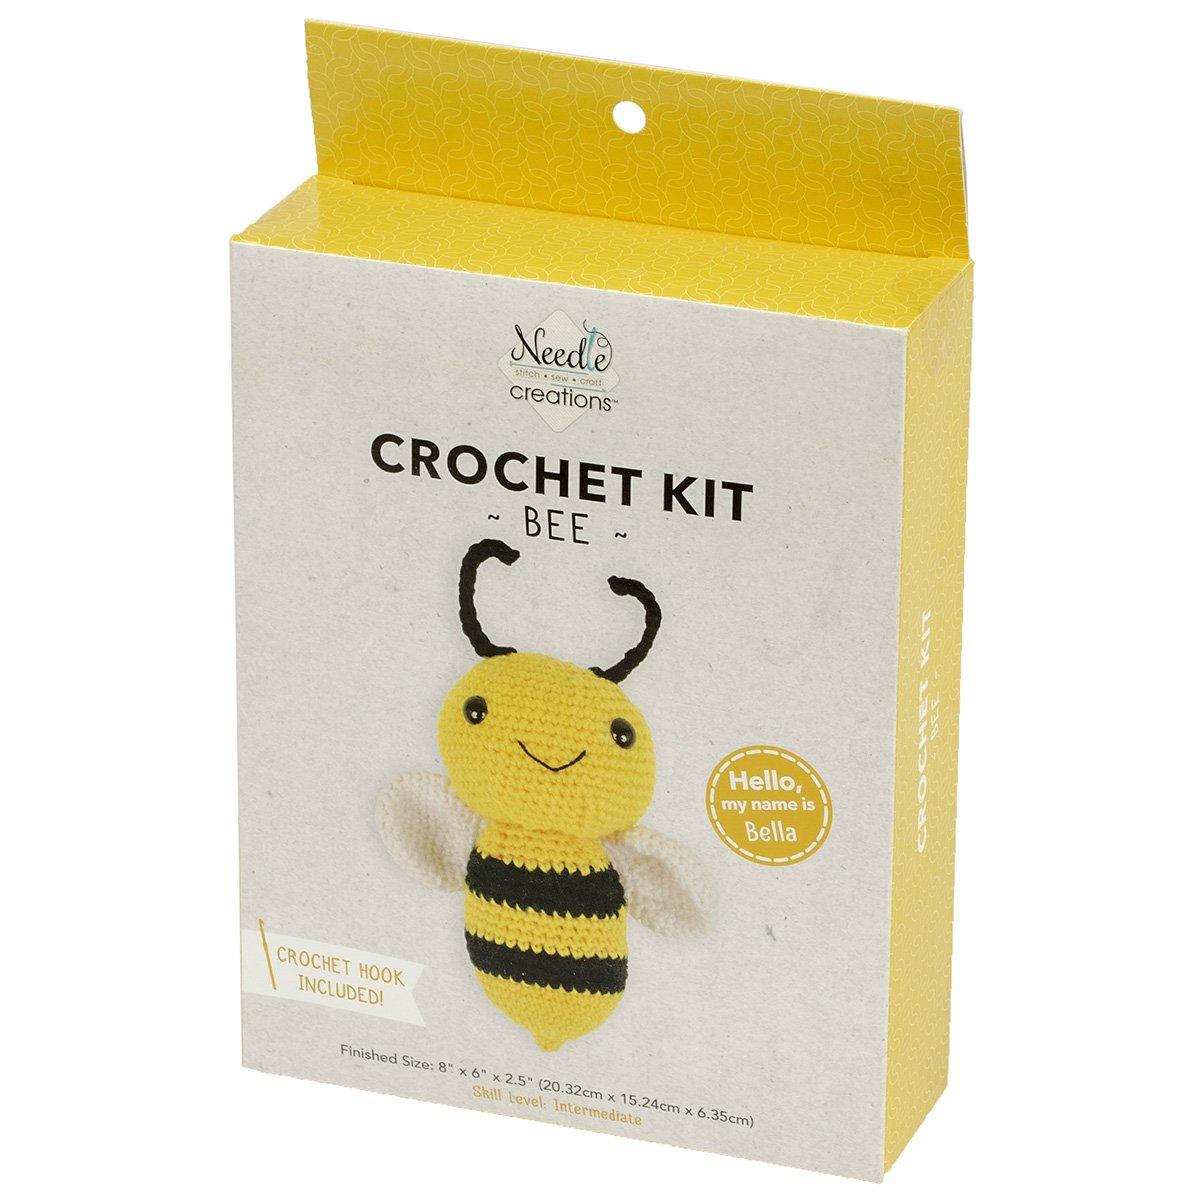 Needle Creations<br>3-D Crochet Kit Bee<br>NC-CRCHKT-BEE